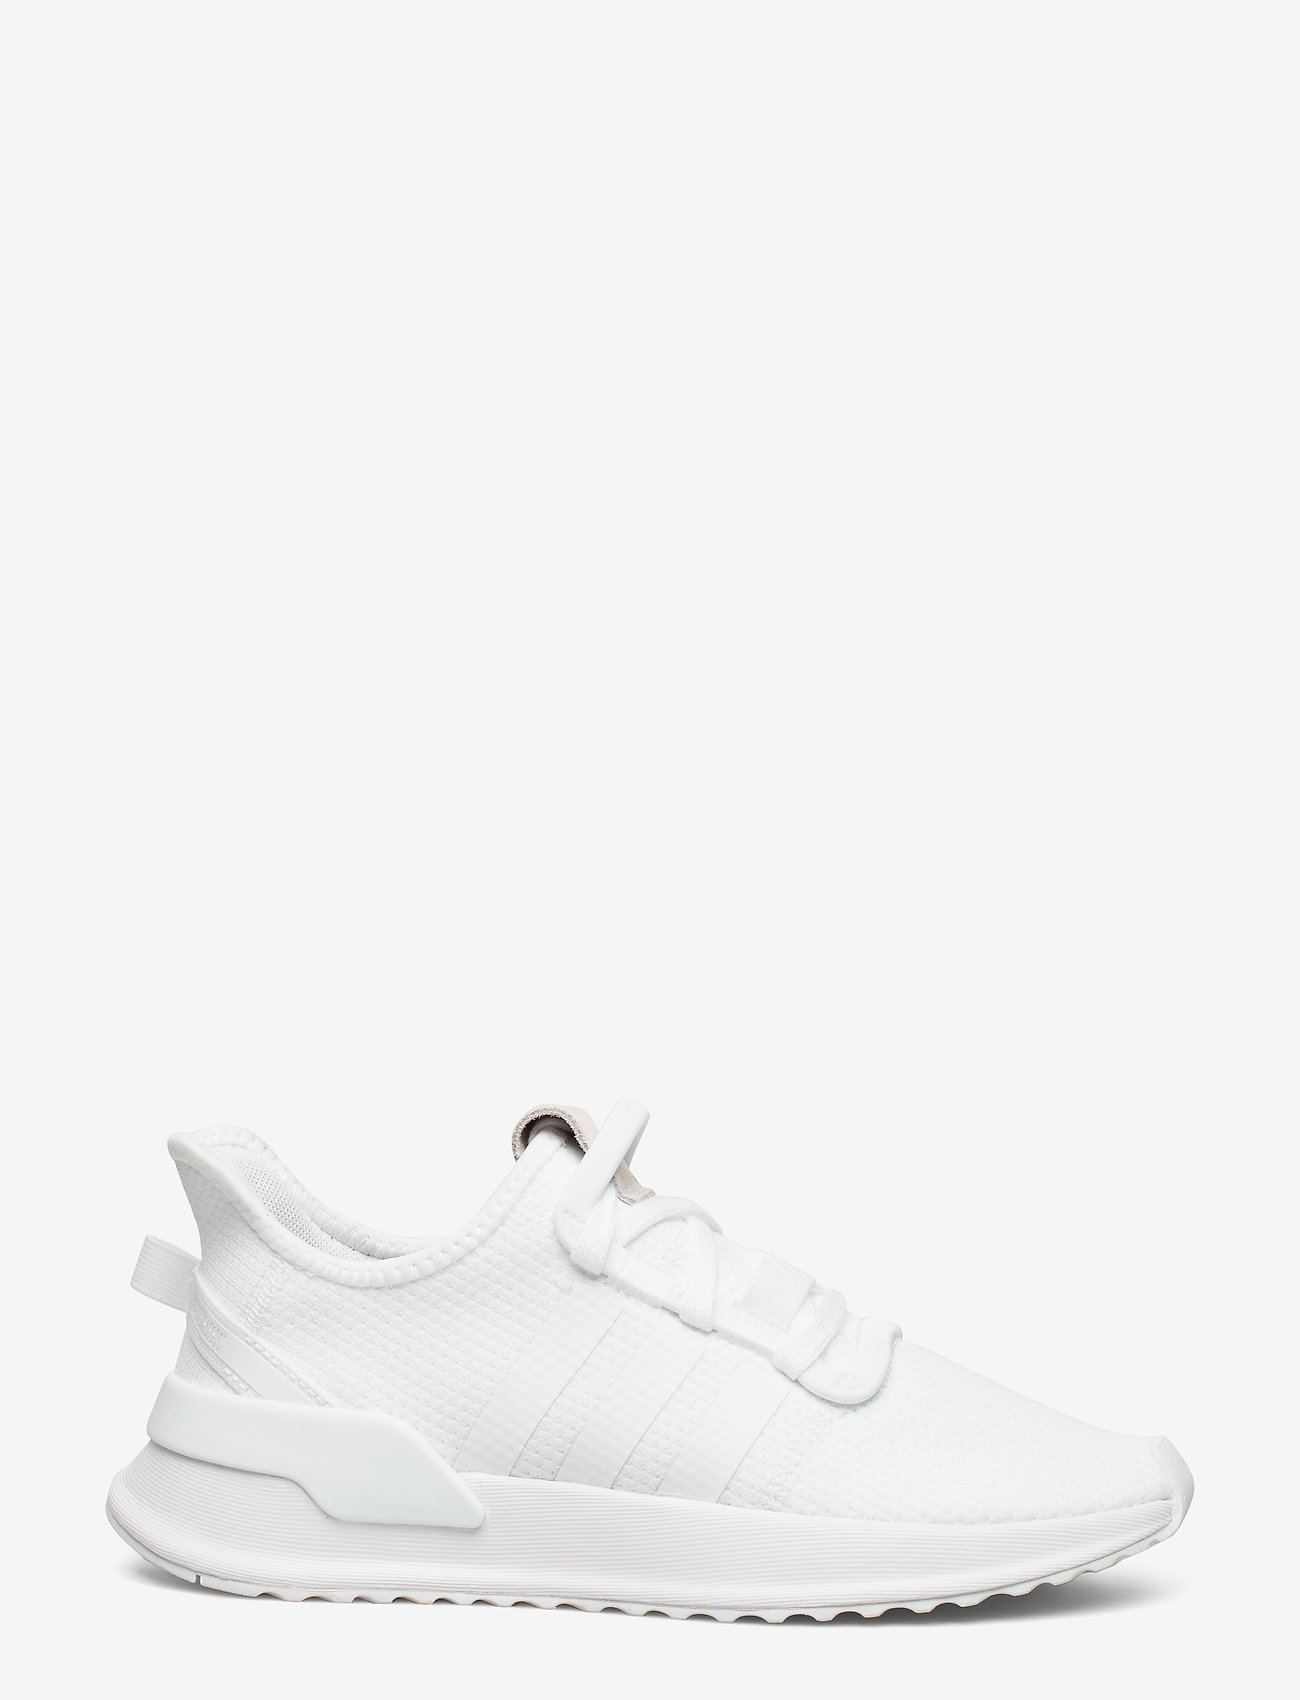 adidas Originals - U_Path Run - niedriger schnitt - ftwwht/ftwwht/ftwwht - 1